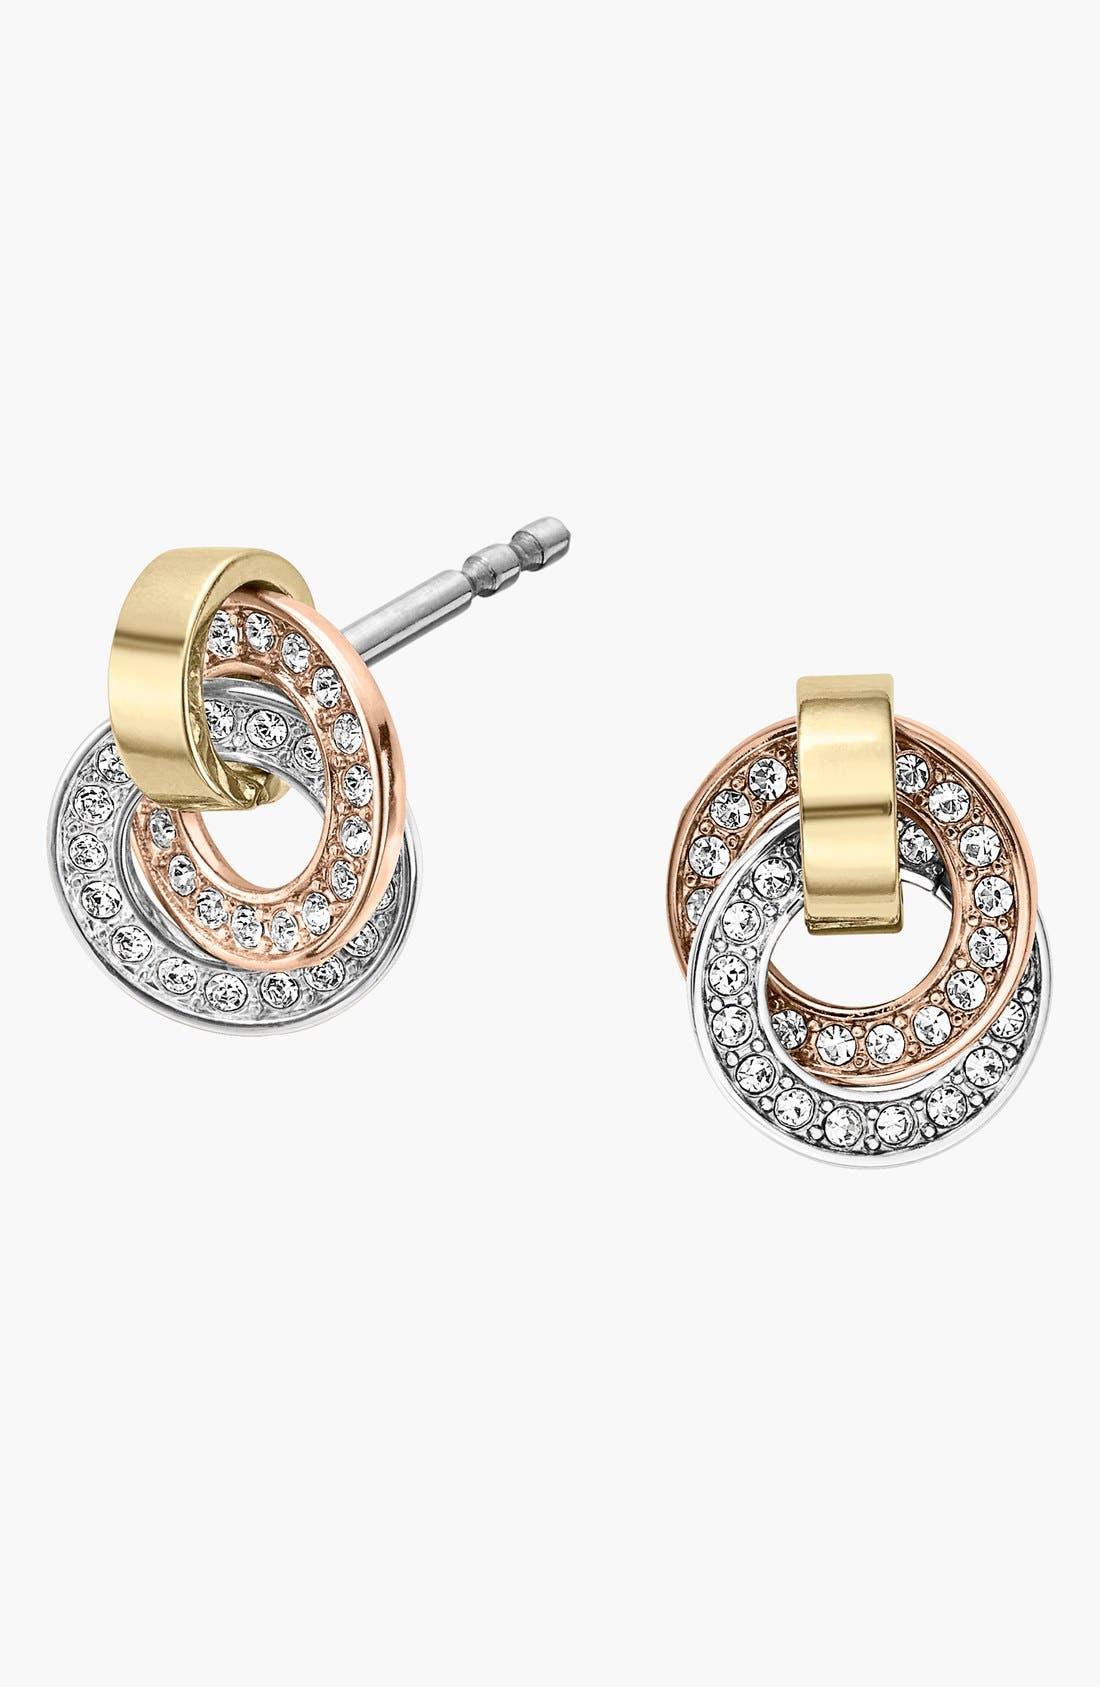 Main Image - Michael Kors 'Statement Brilliance' Pavé Stud Earrings